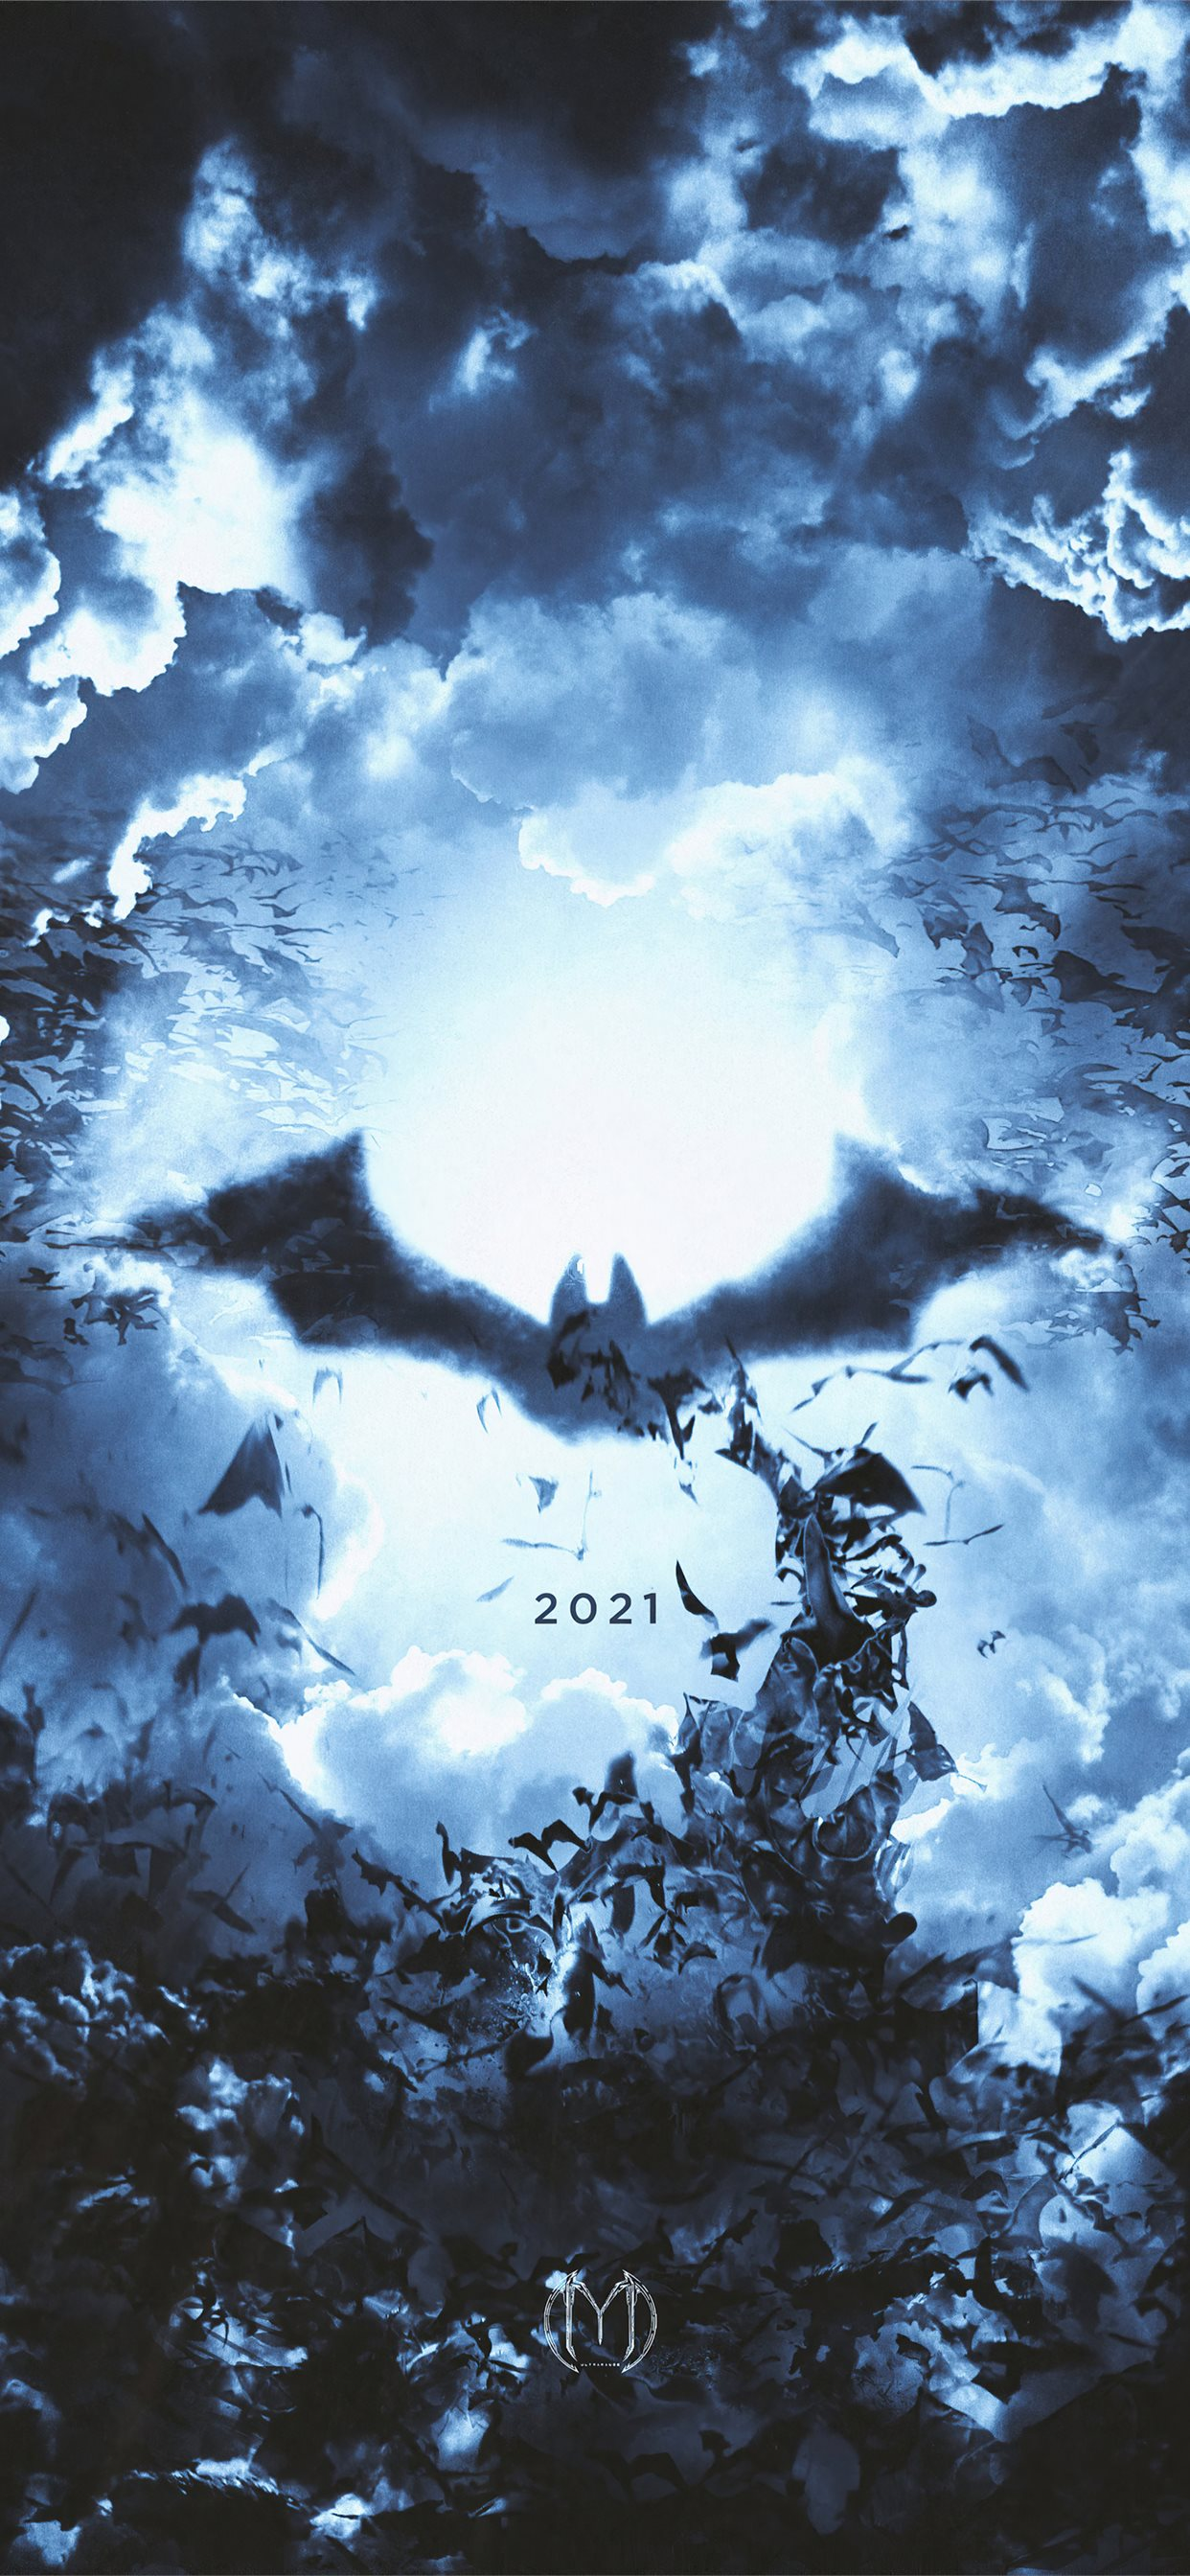 the batman logo 2021 iPhone 11 Wallpapers Download 1242x2688